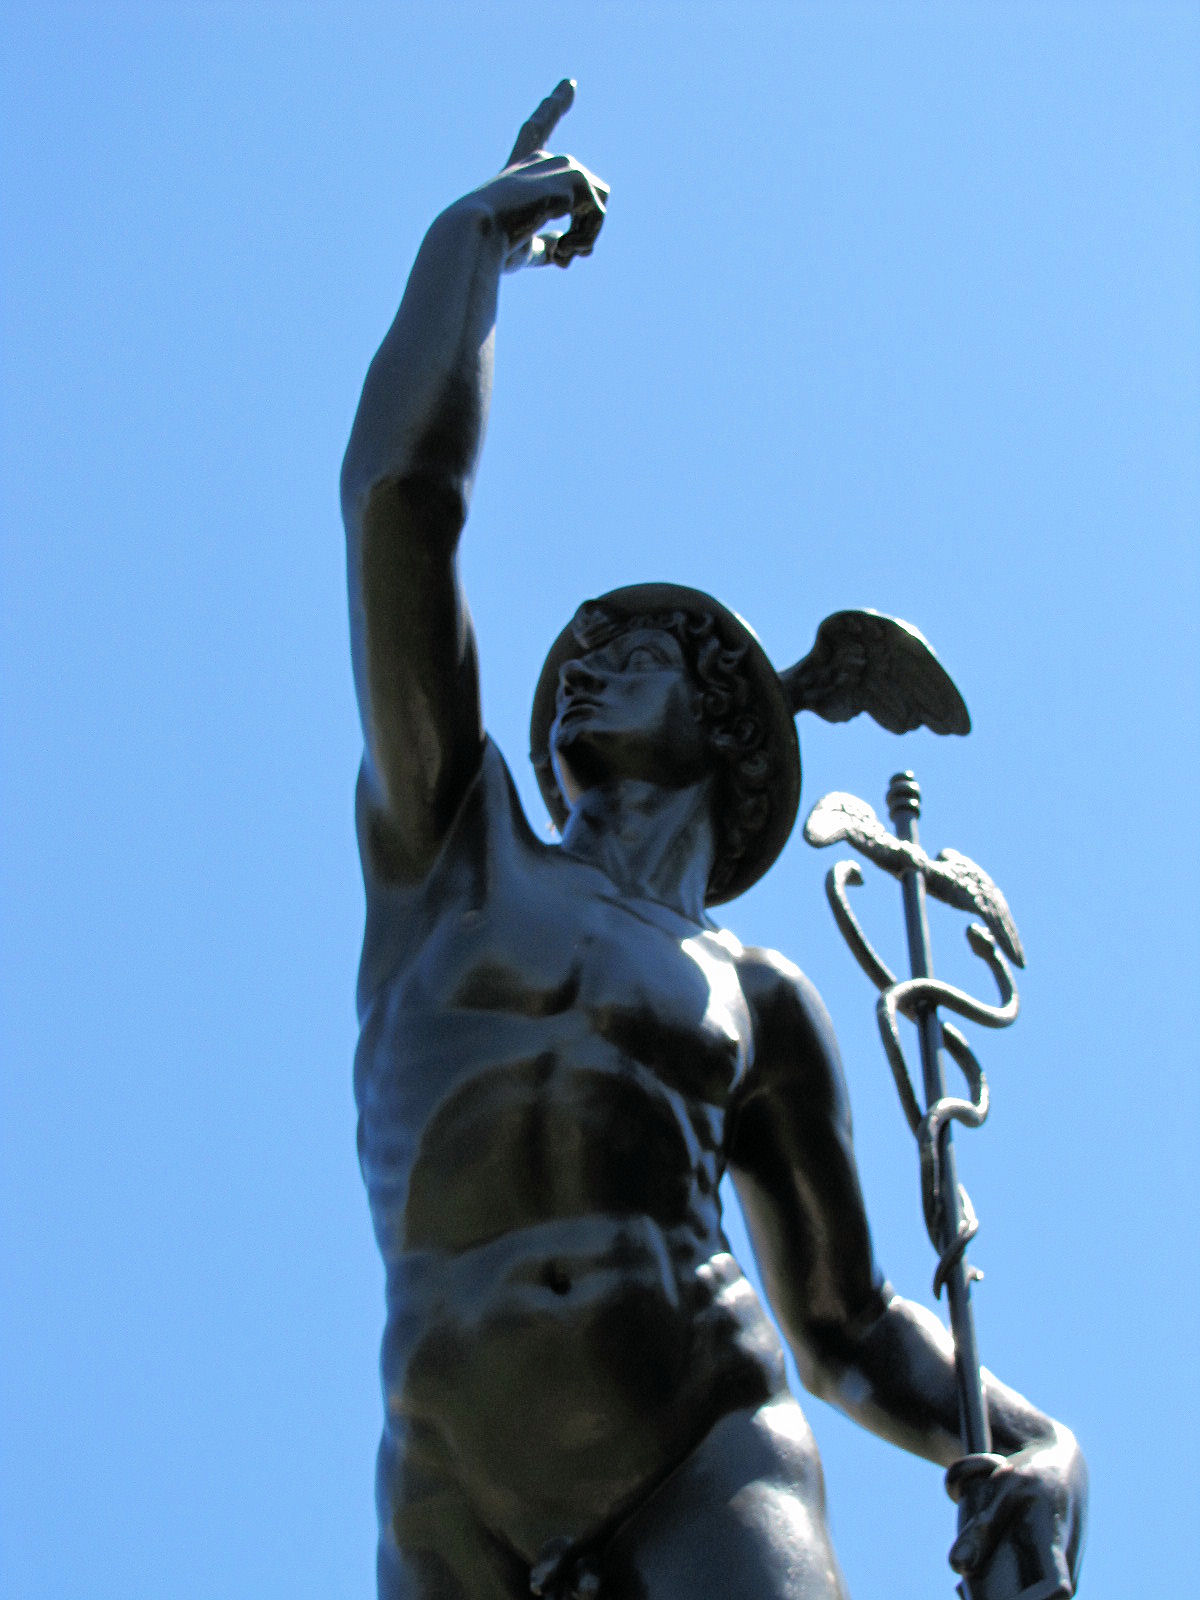 Mercury (Roman god) and Mercury (planet) - Englewood, CO Image